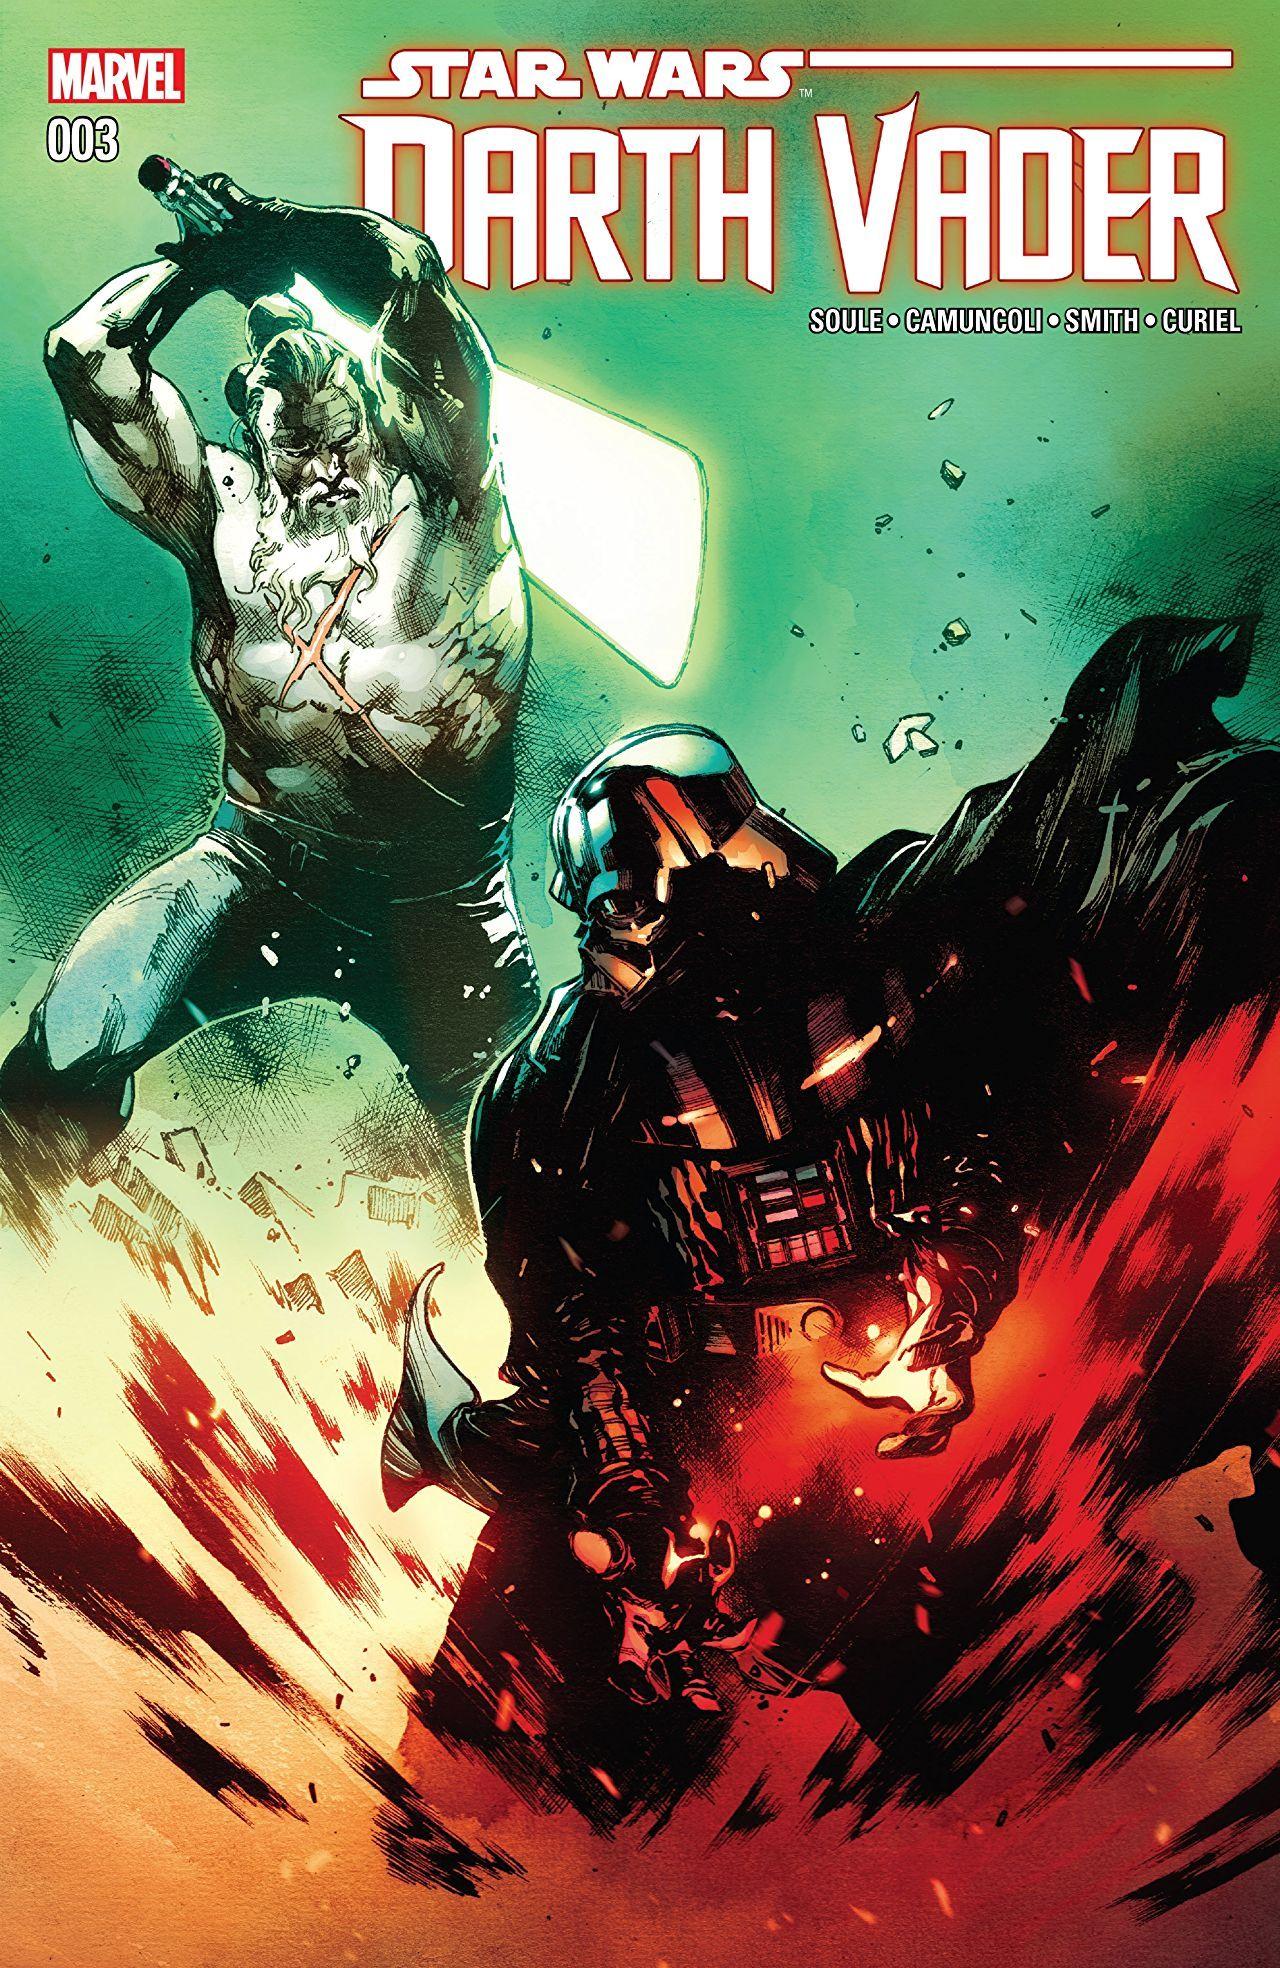 Darth Vader (2017-2018) #3 | Star wars comic books, Star